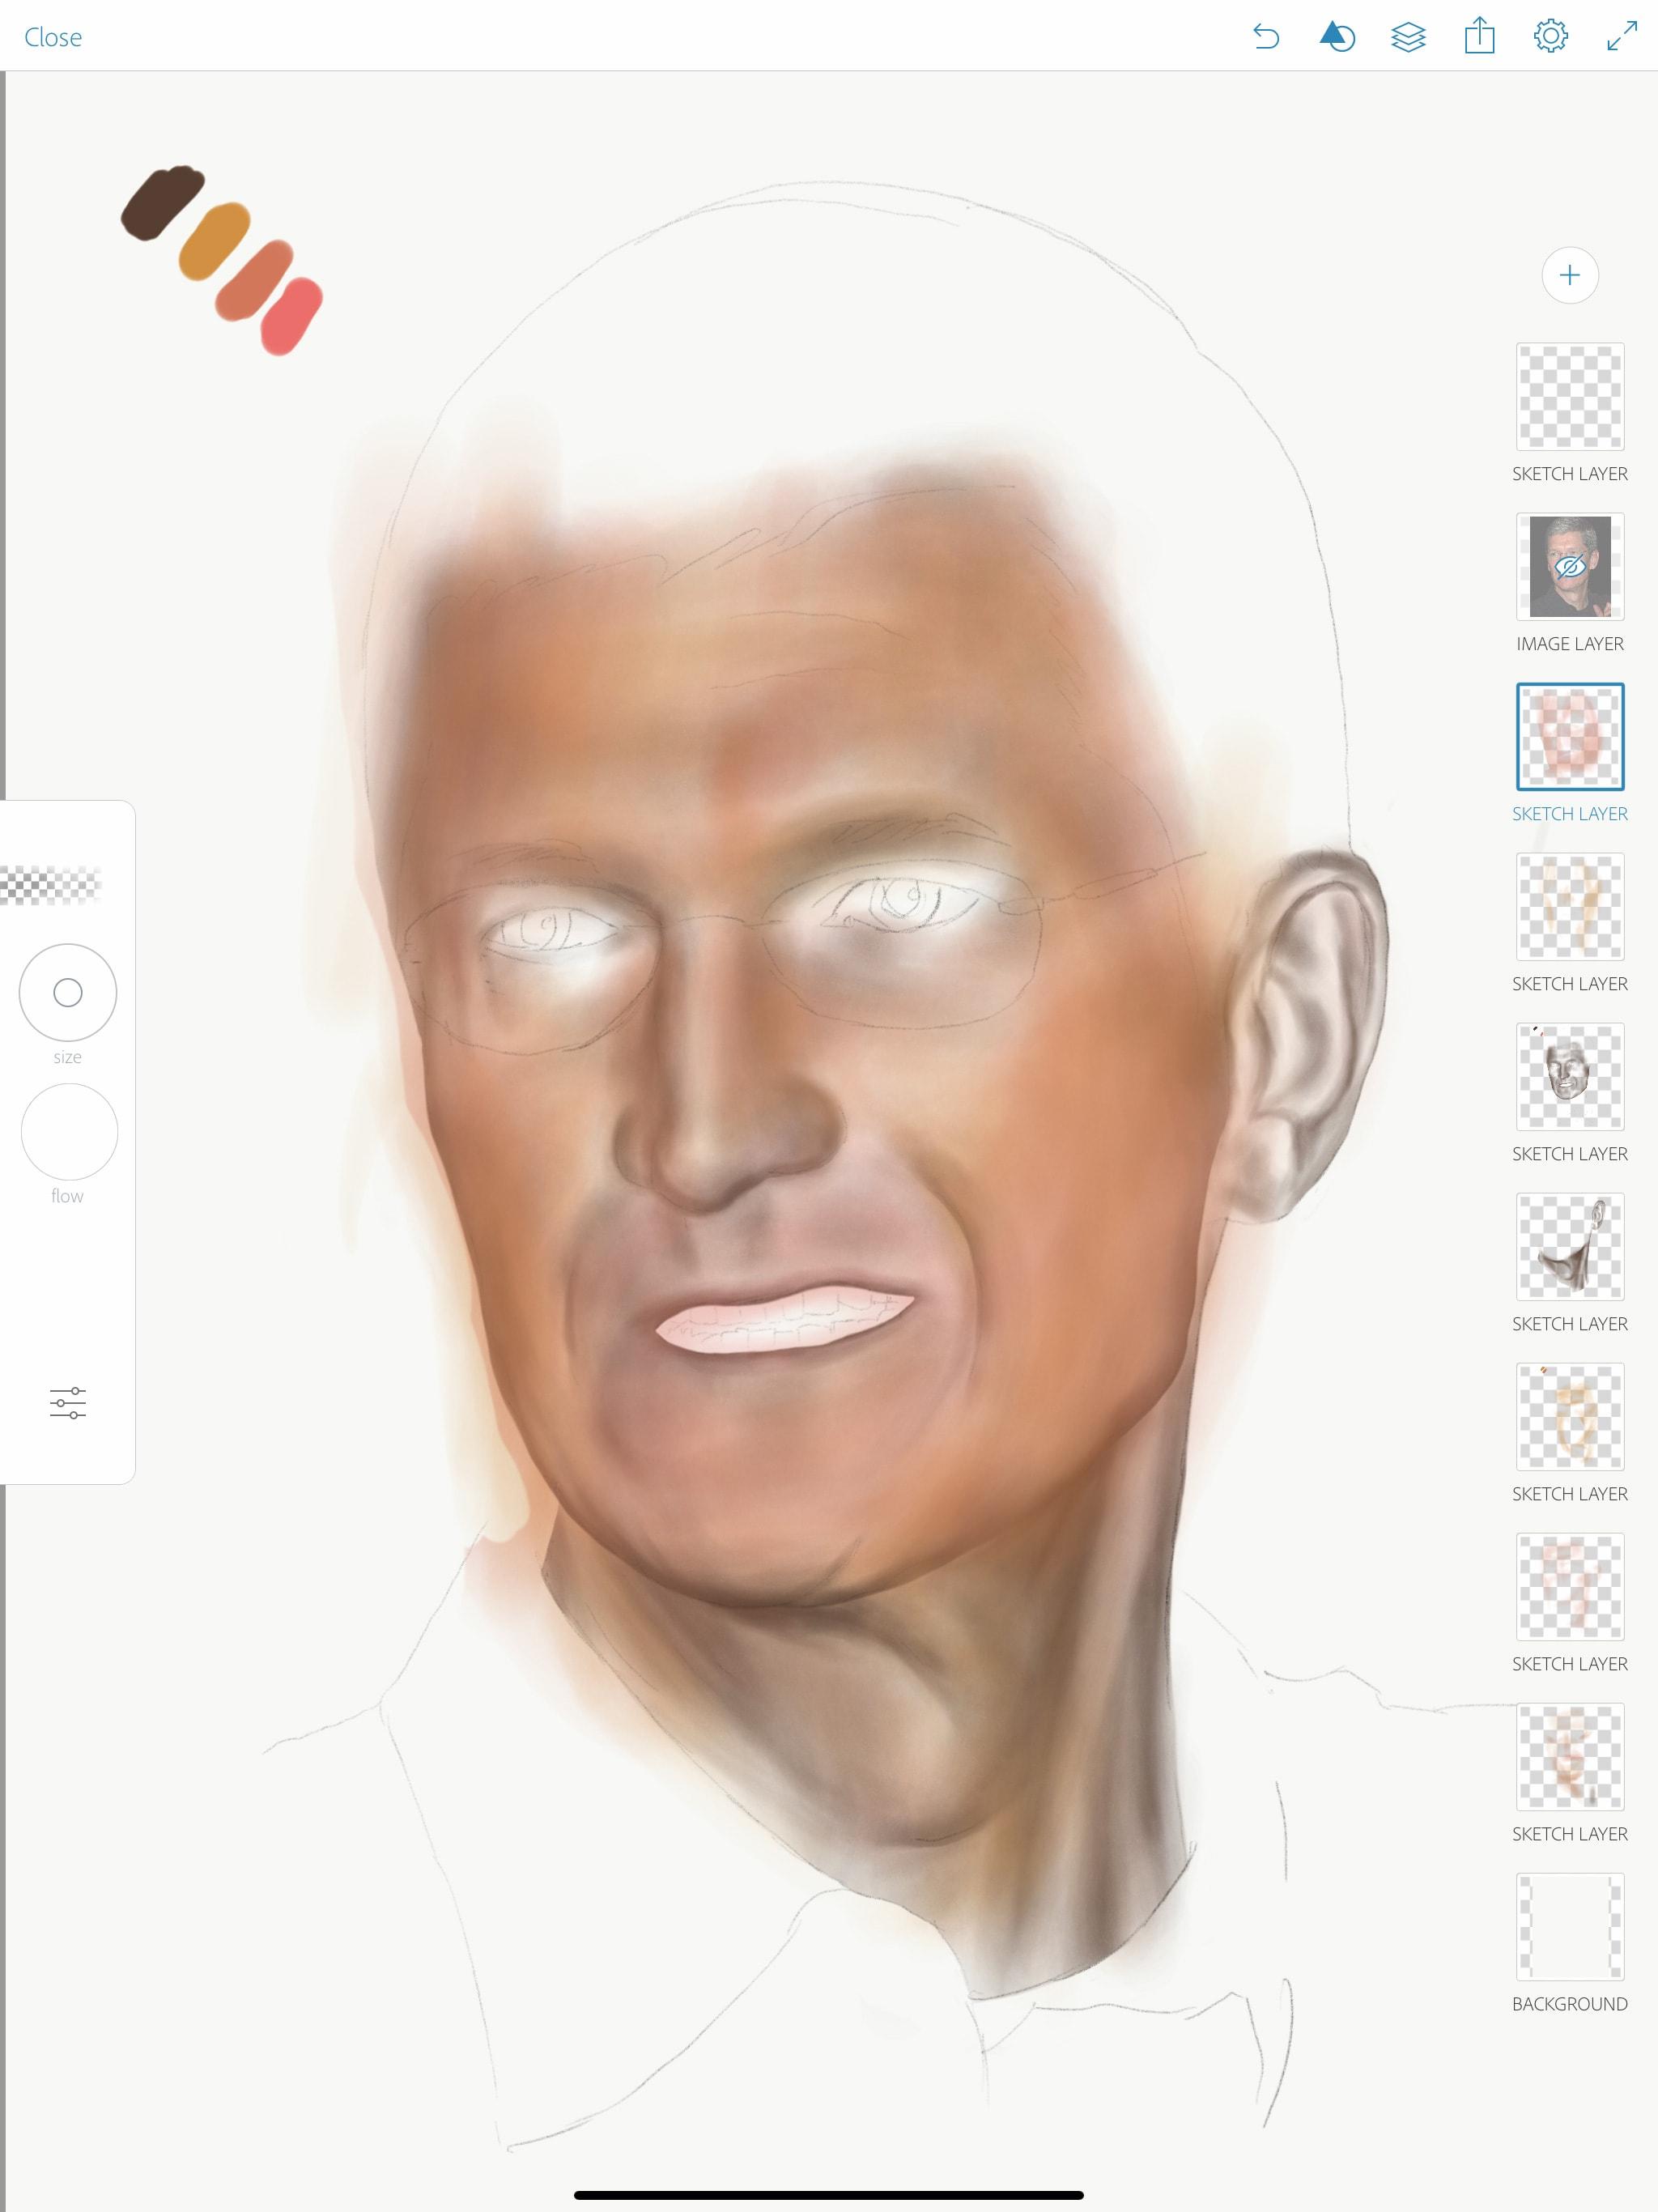 Apple Pencil portraiture: Step 3: Add some color